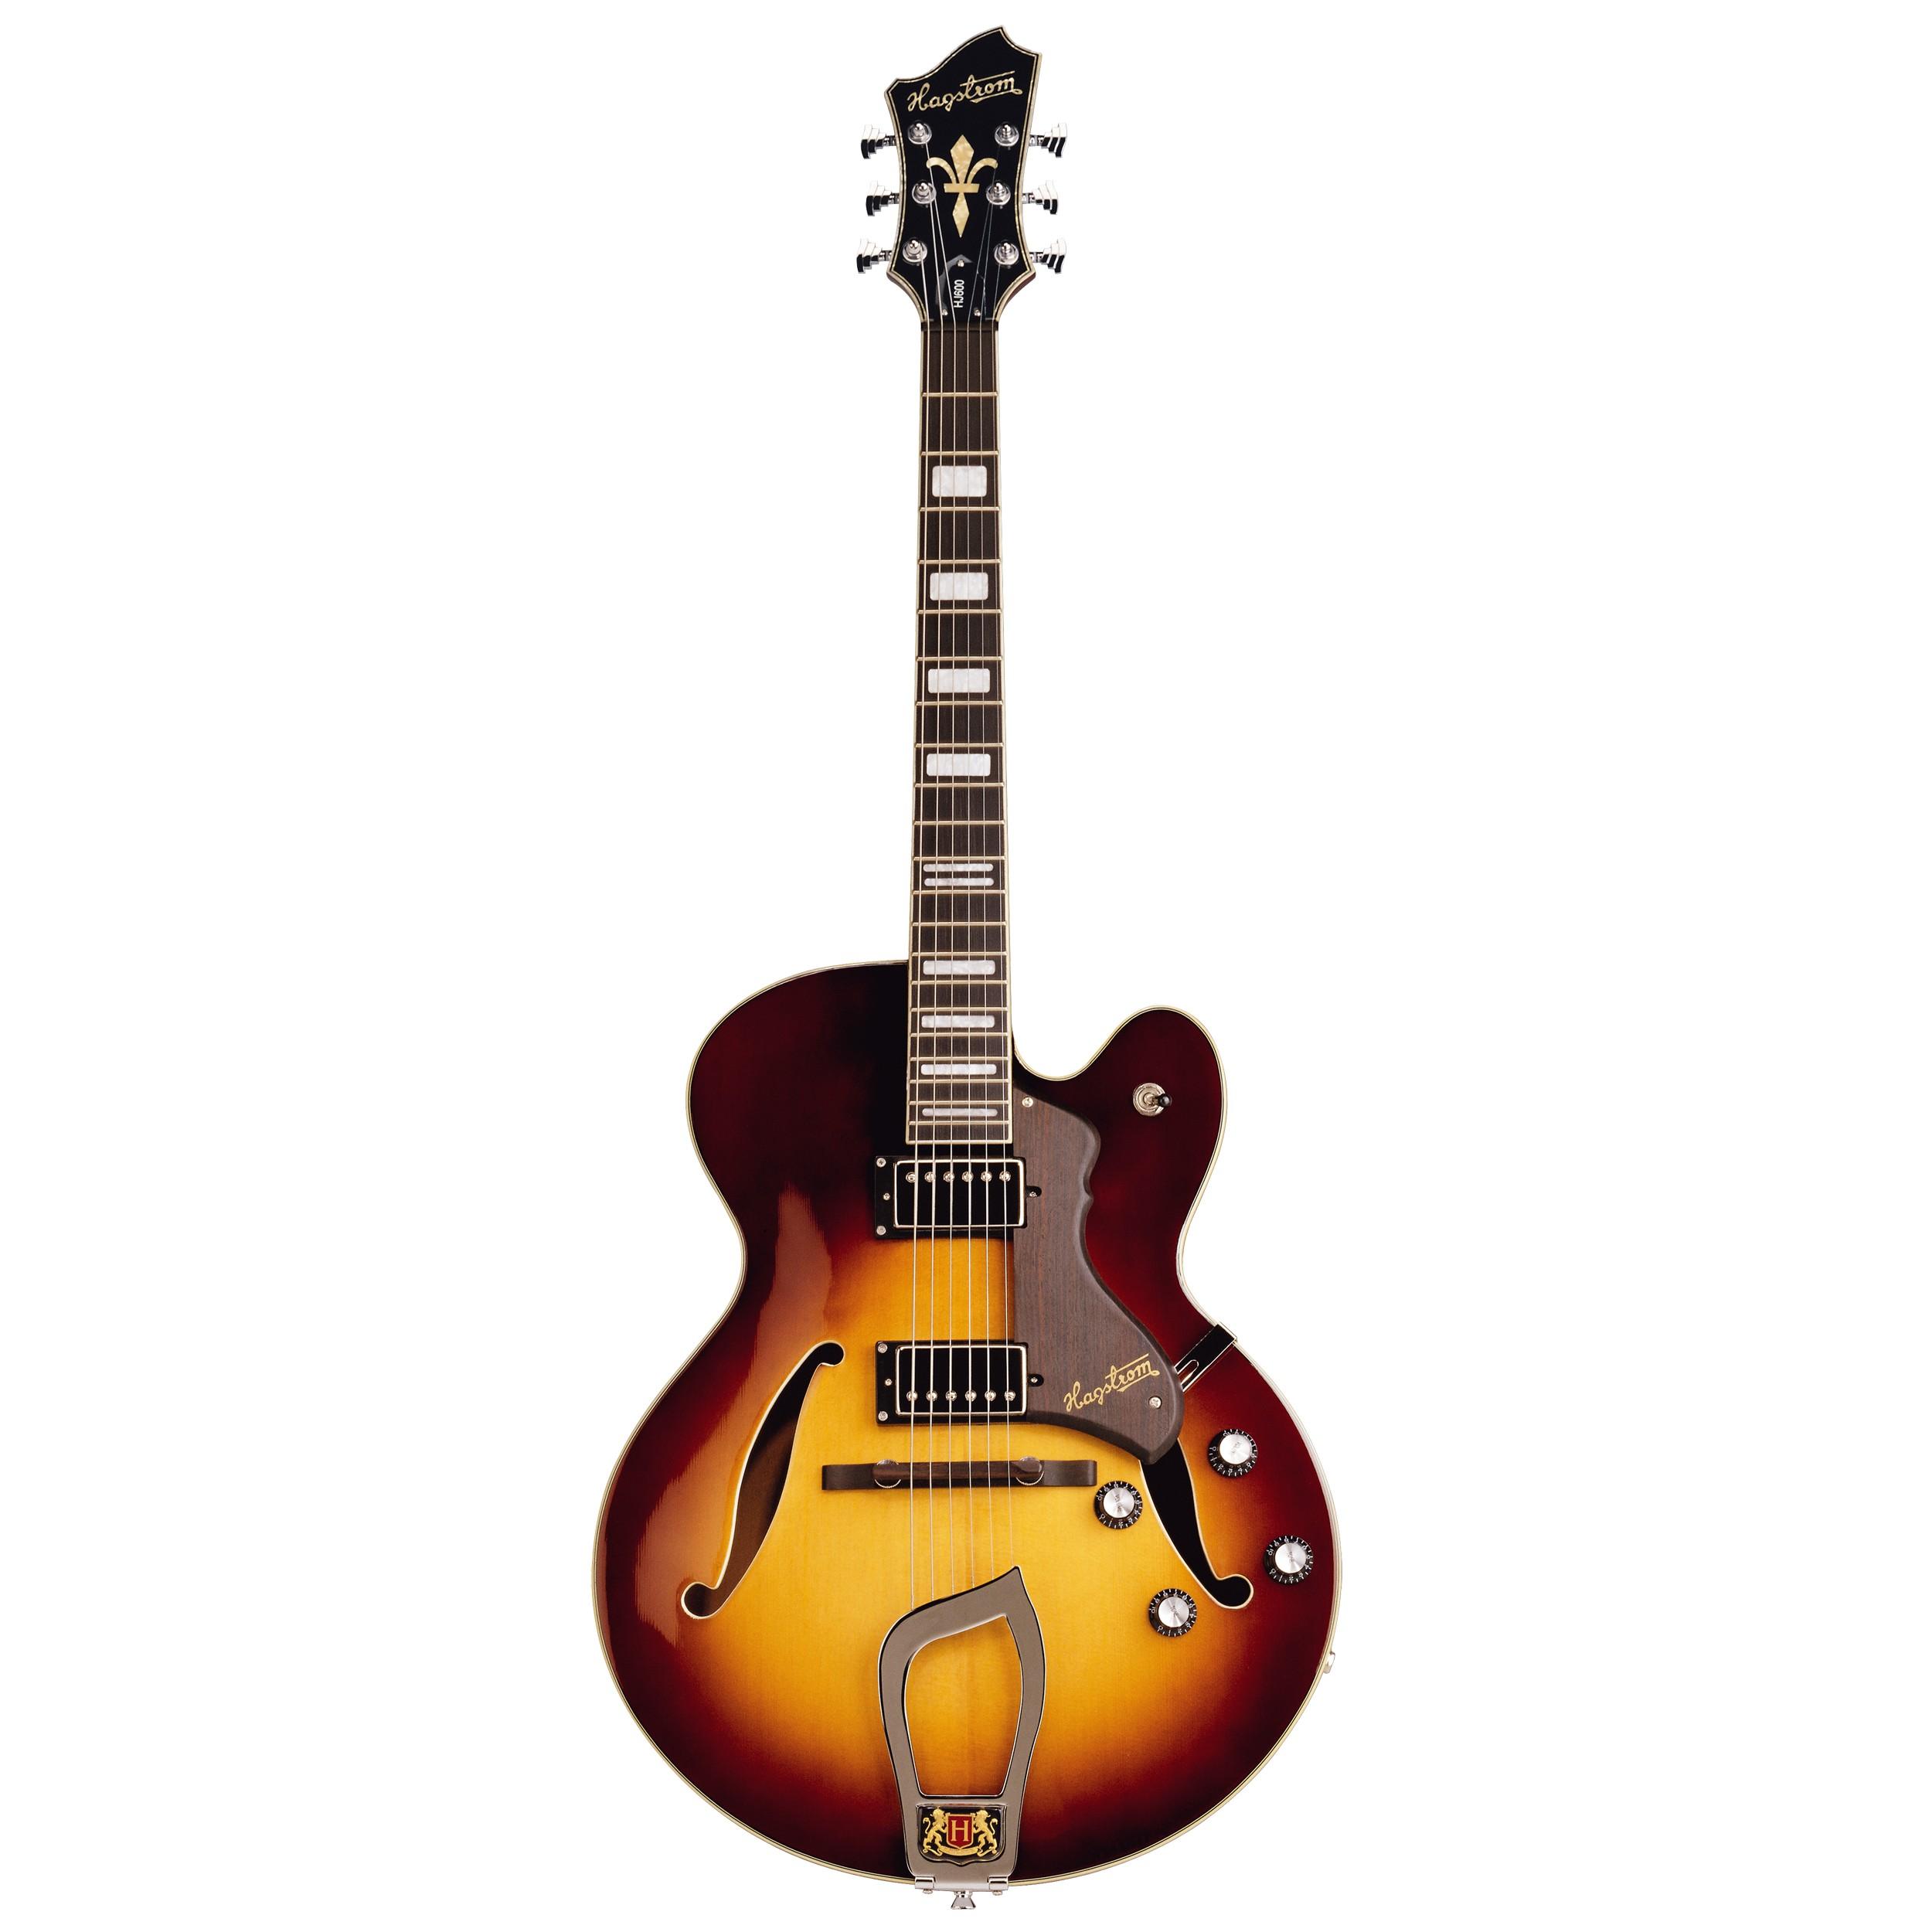 Hagstrom HJ 800 Jazzgitarre 3-Tone Sunburst